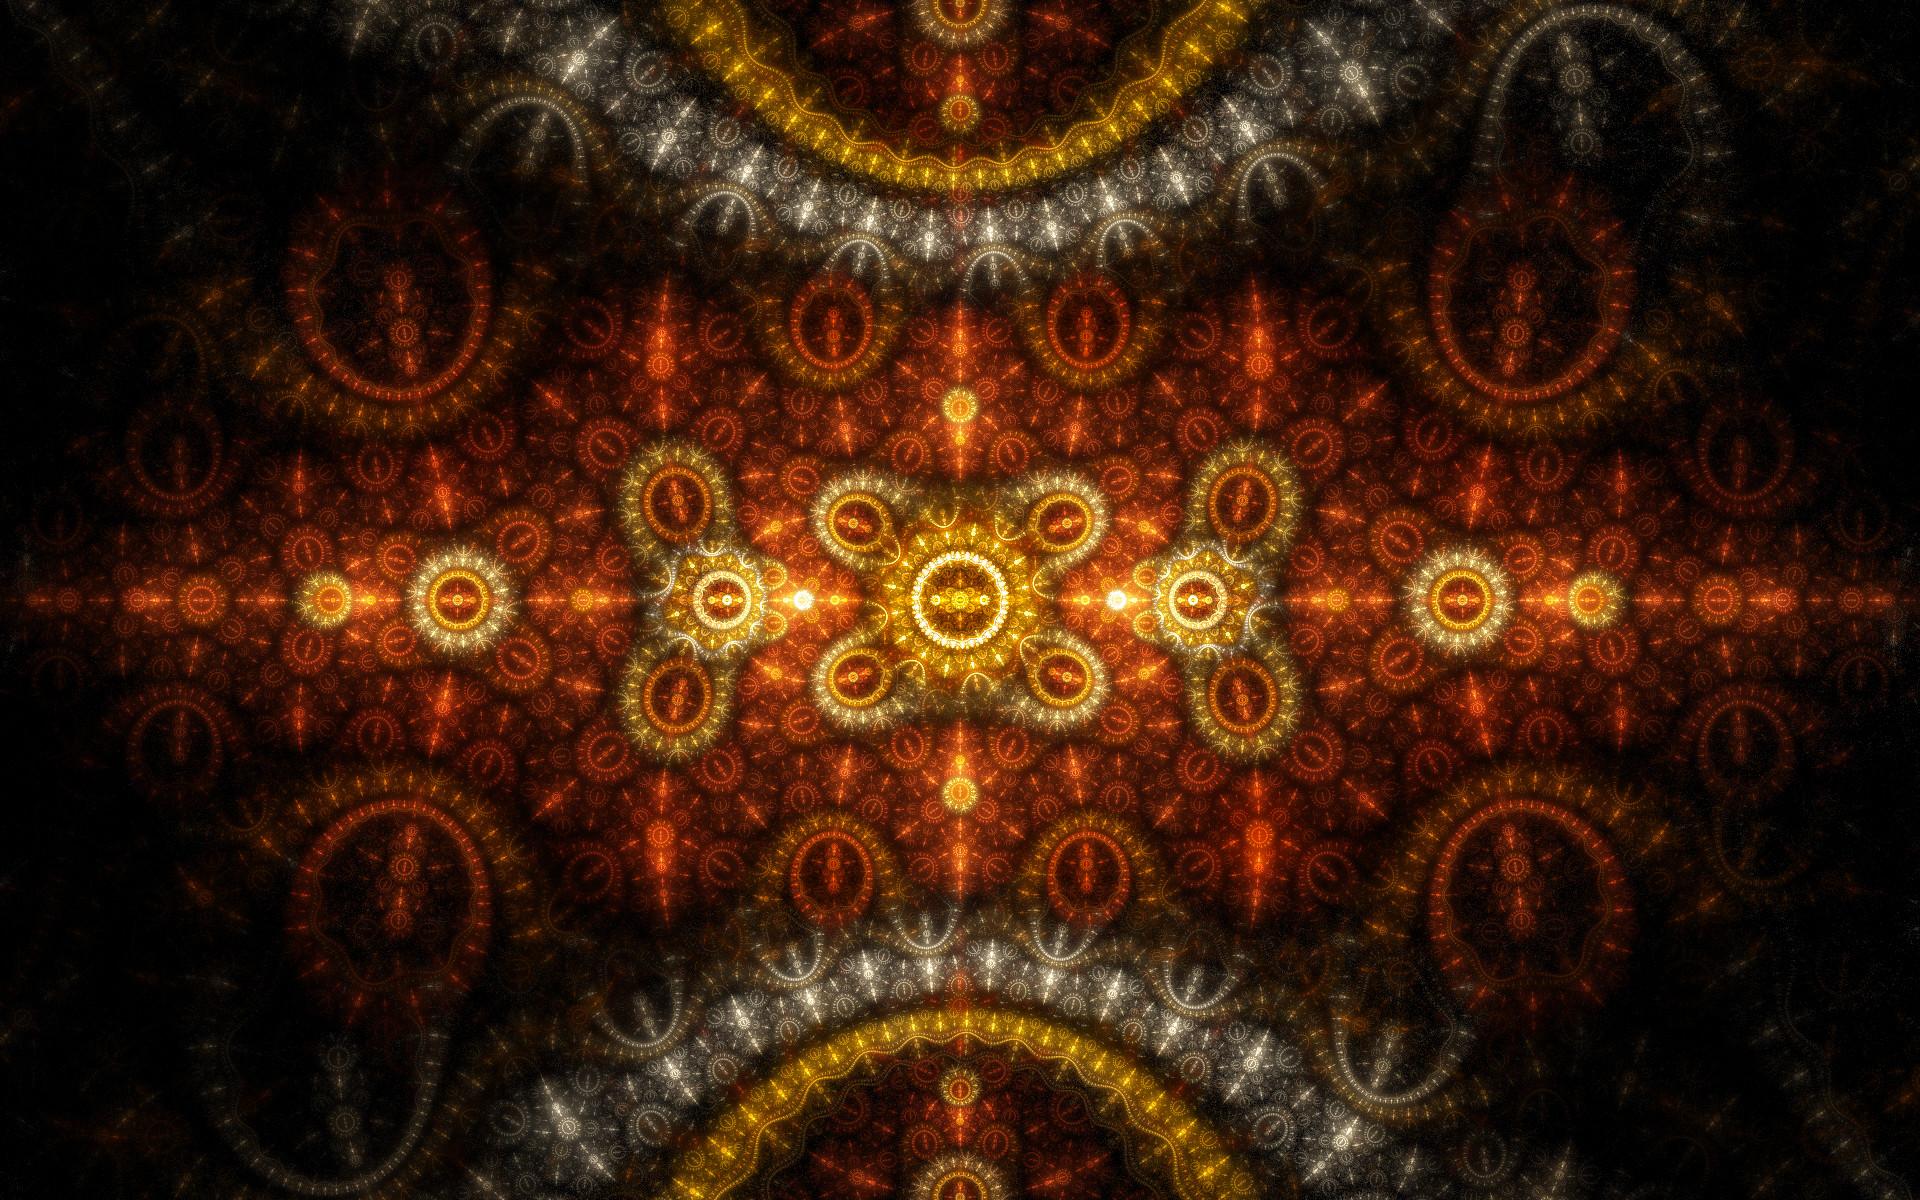 hd-fractal-wallpaper-1920×1200-1006027.jpg (1920×1200)